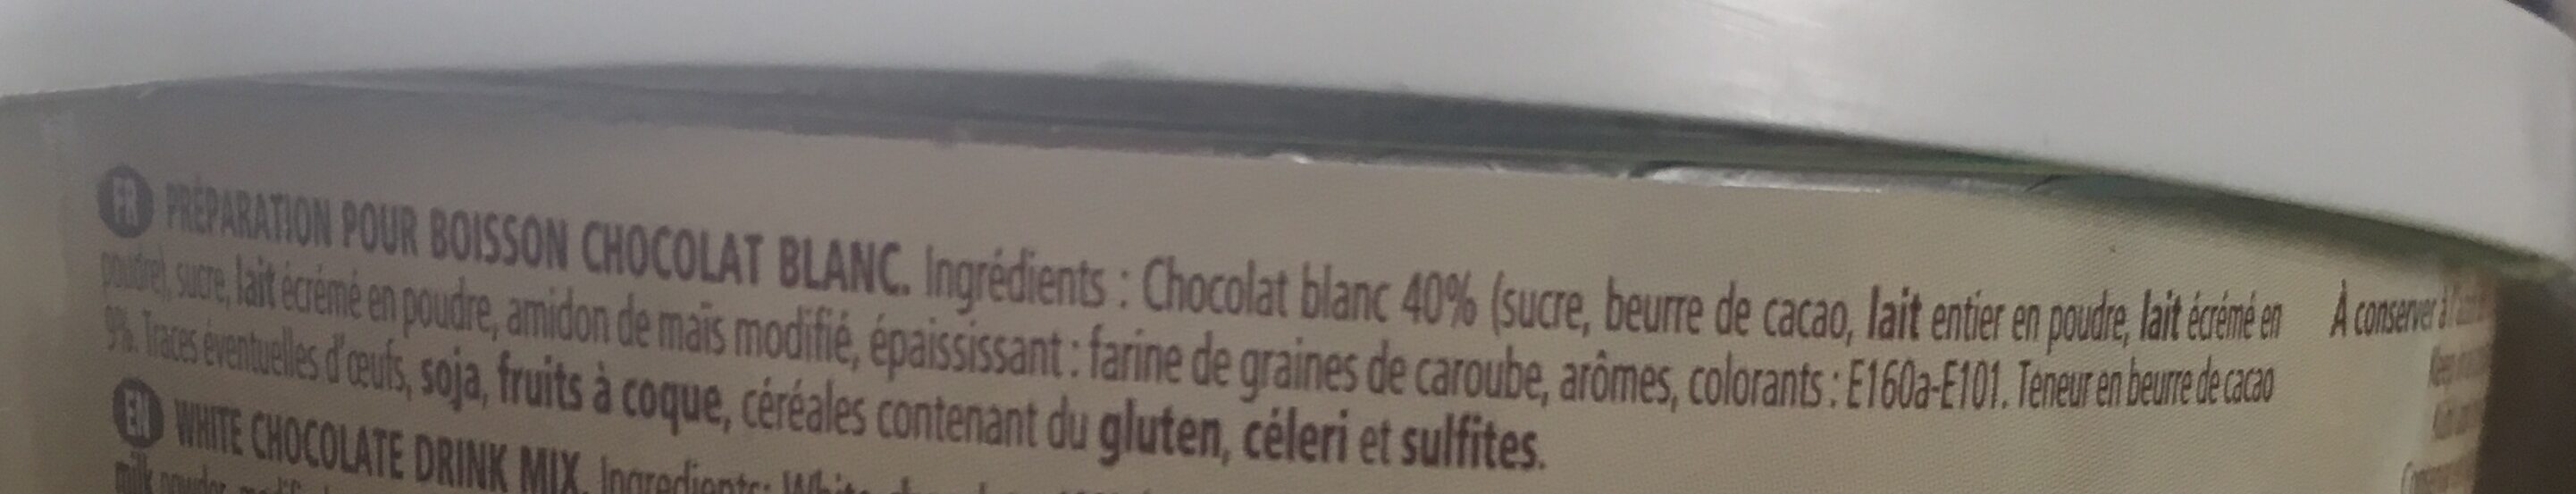 Monbana White Chocolate Trinkschokolade Tresor 500g Dose - Ingredients - fr